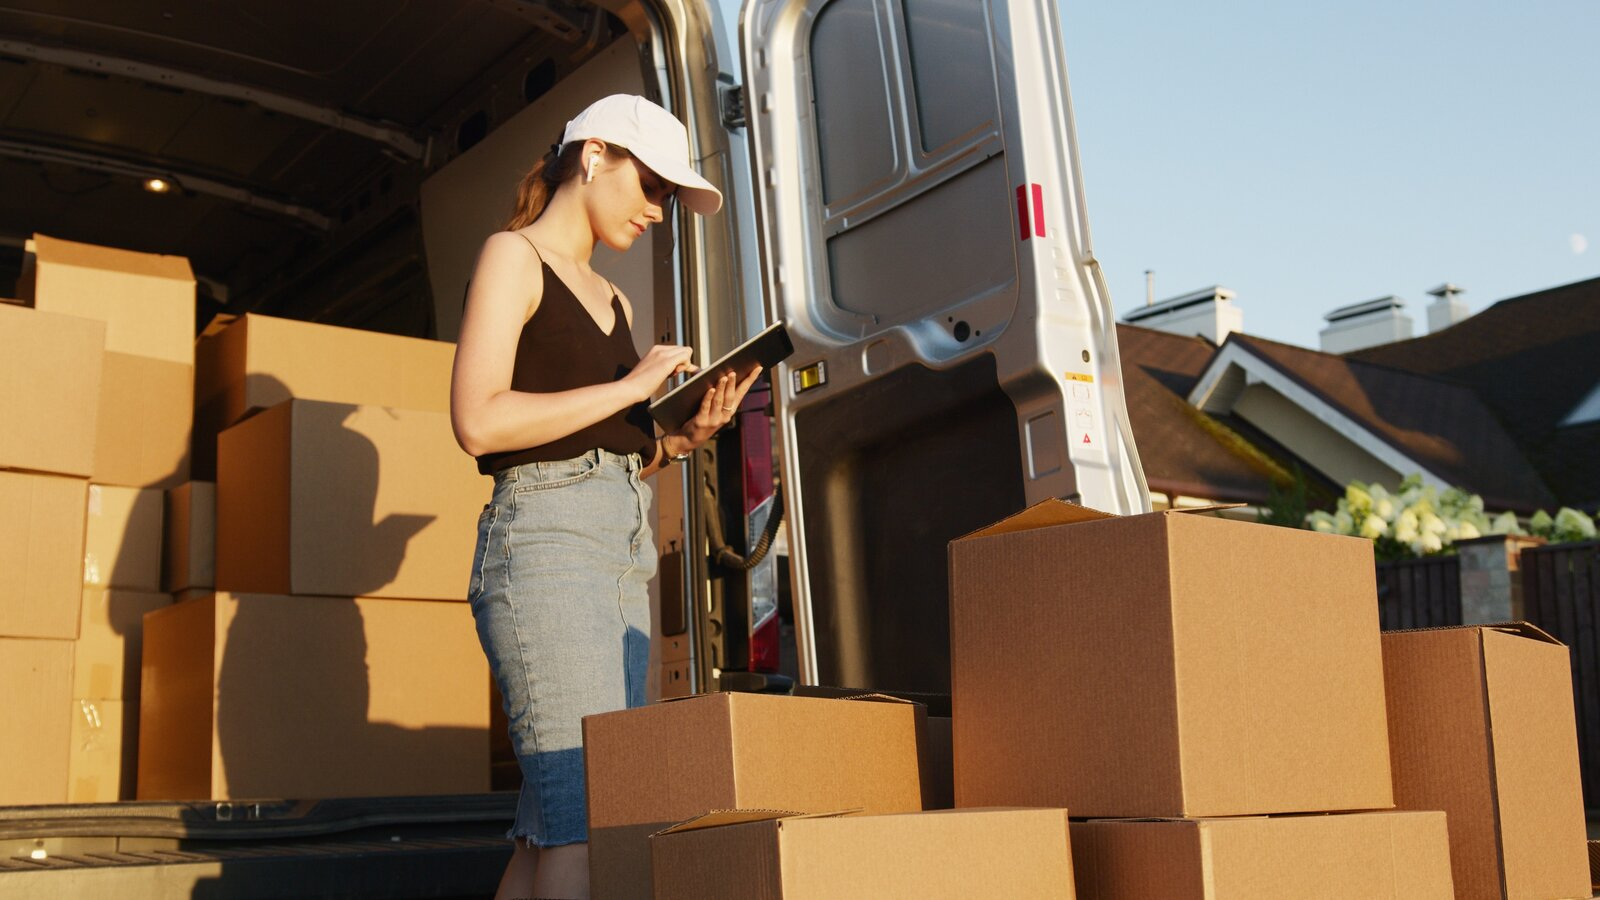 Duurzamer in de logistiek: 3 tips